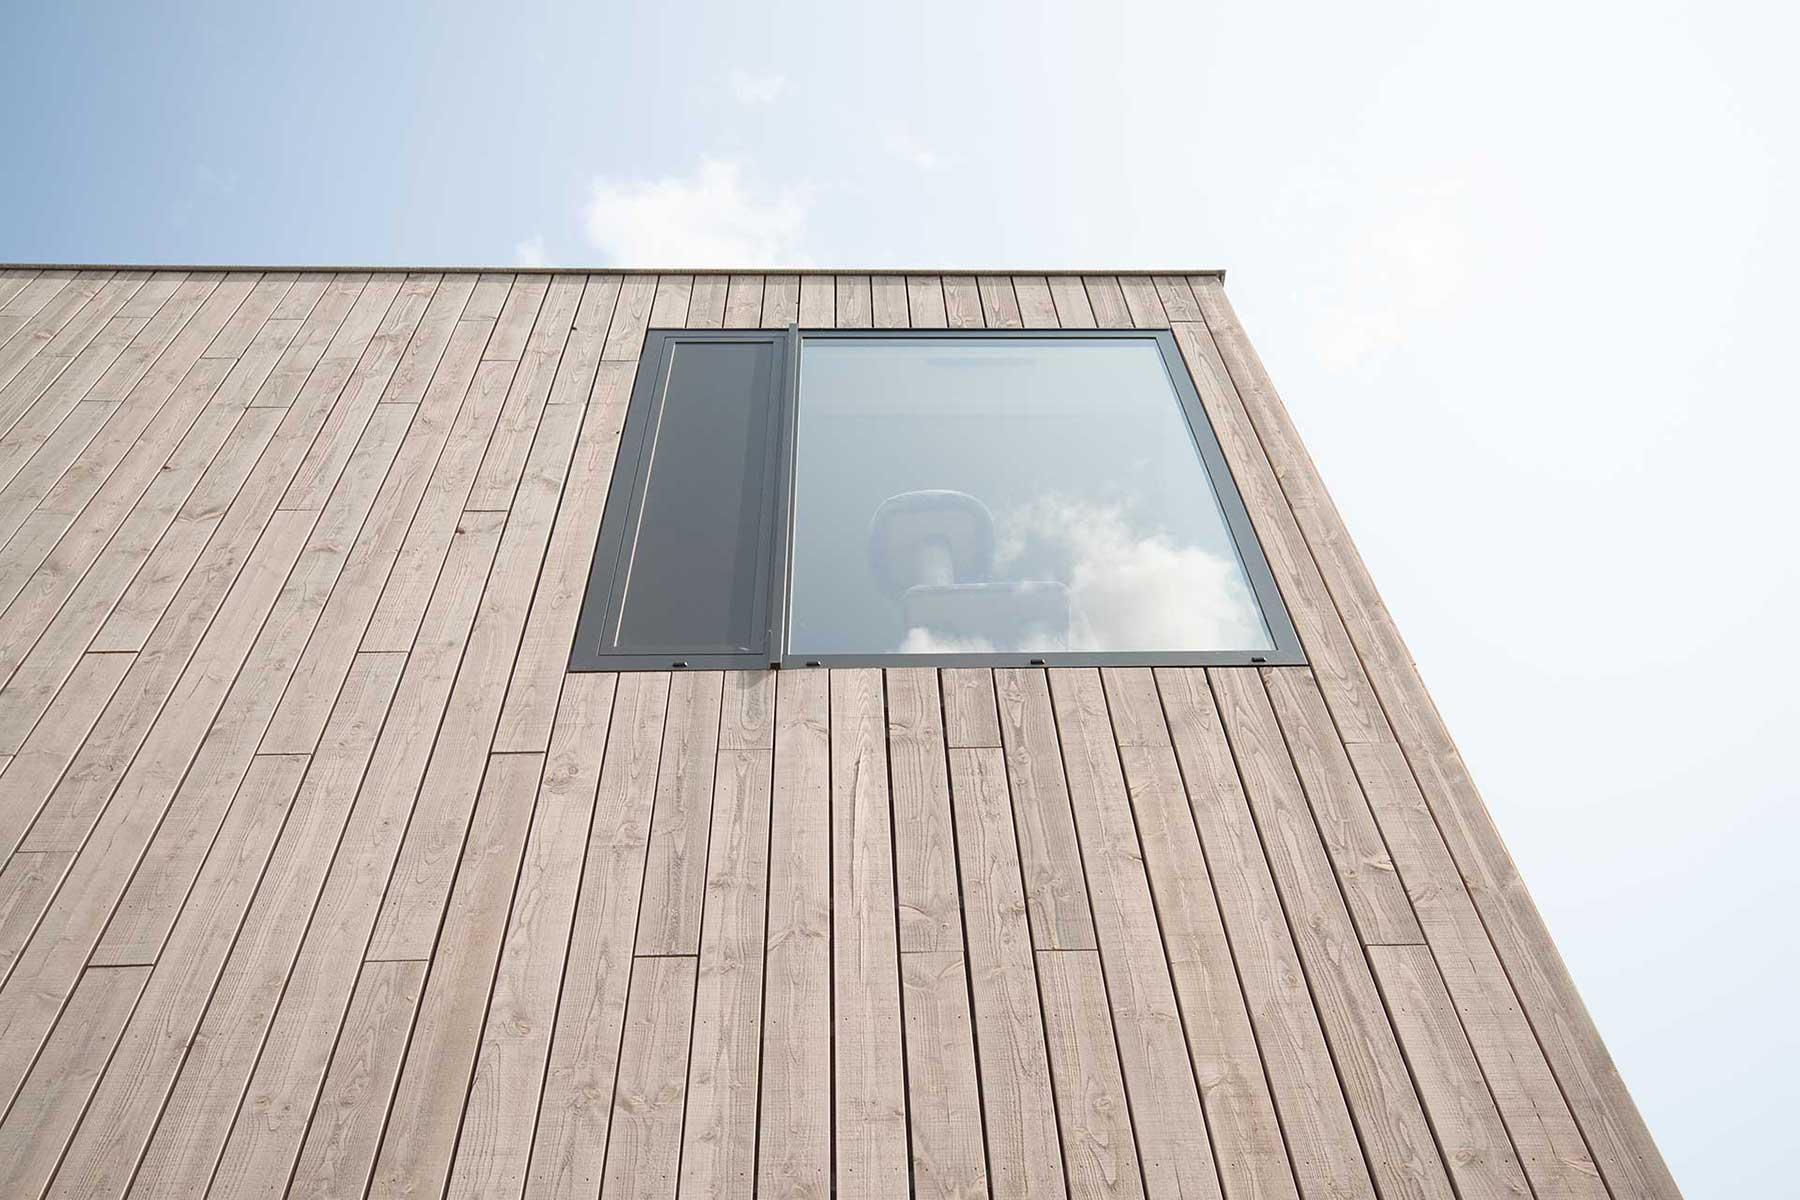 8A-Architecten-datcha-house-4-Almere-04